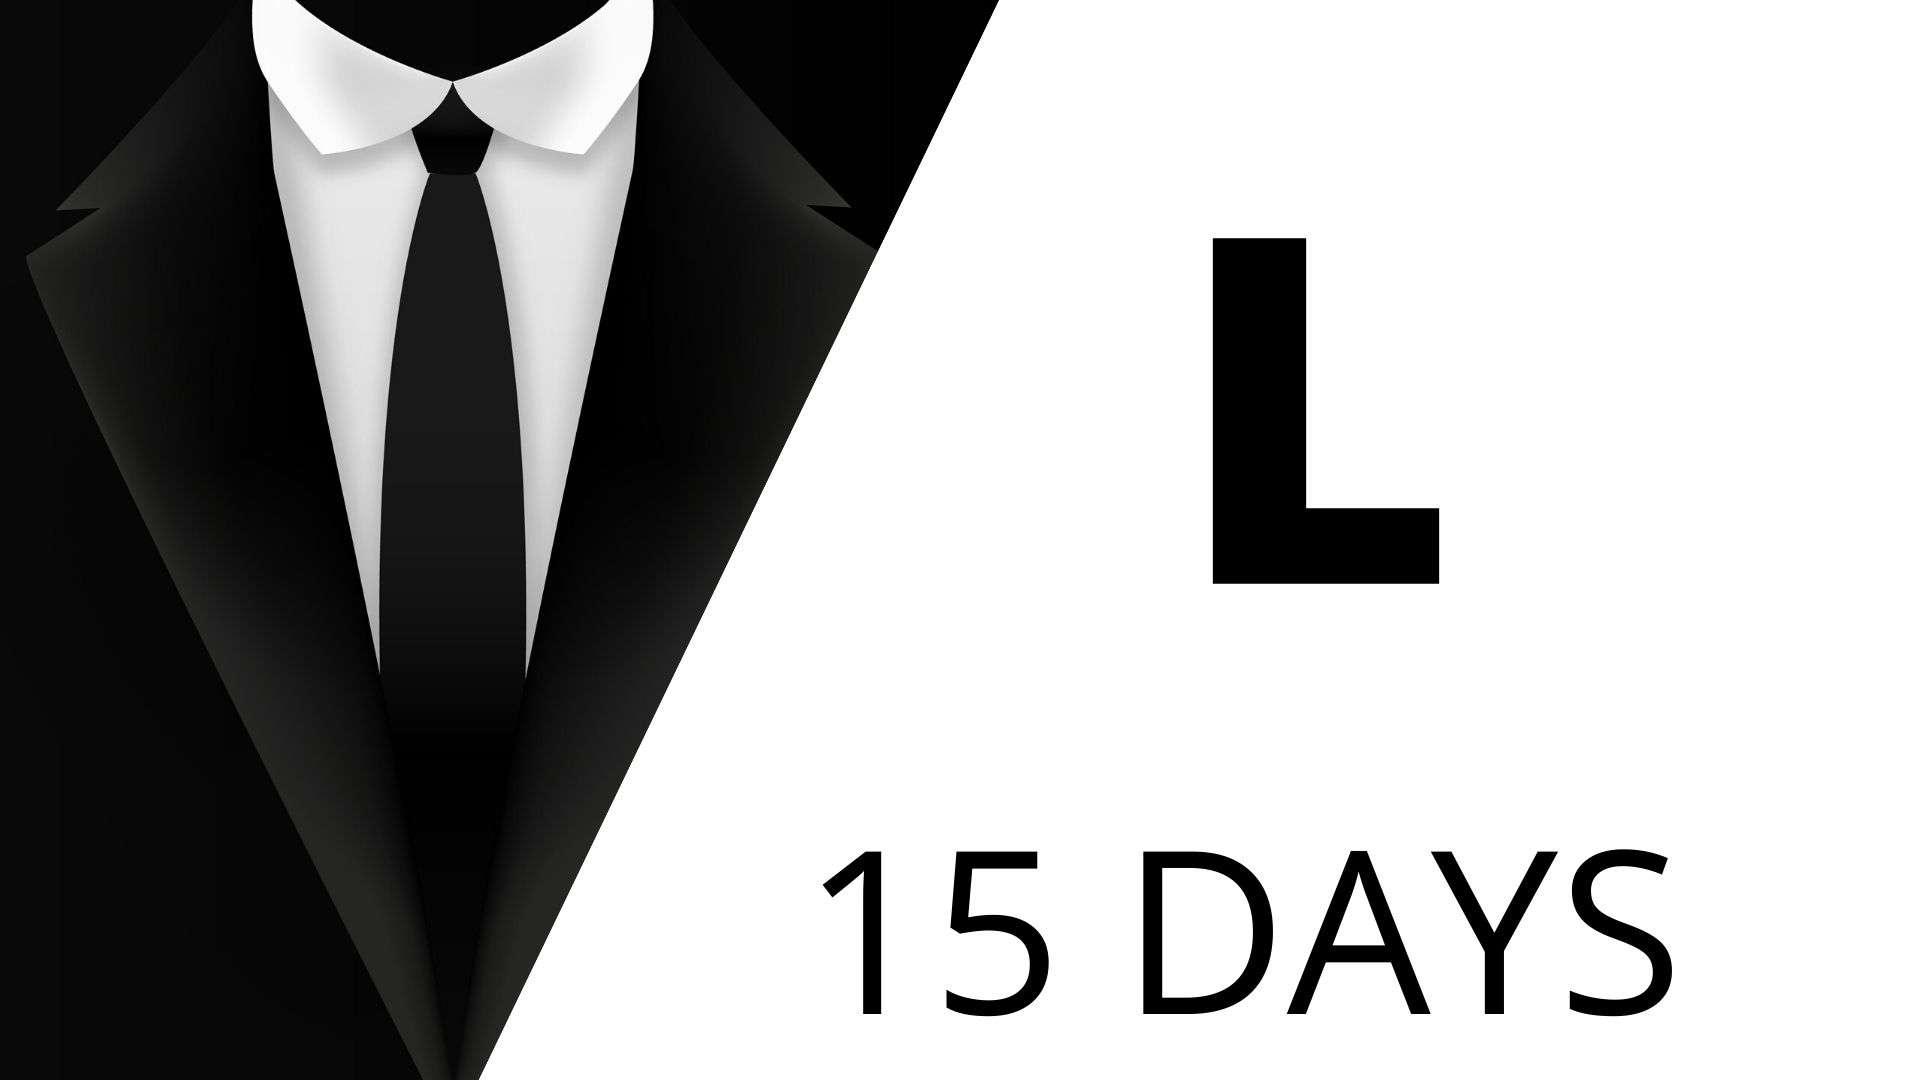 15 days chauffeur on demand